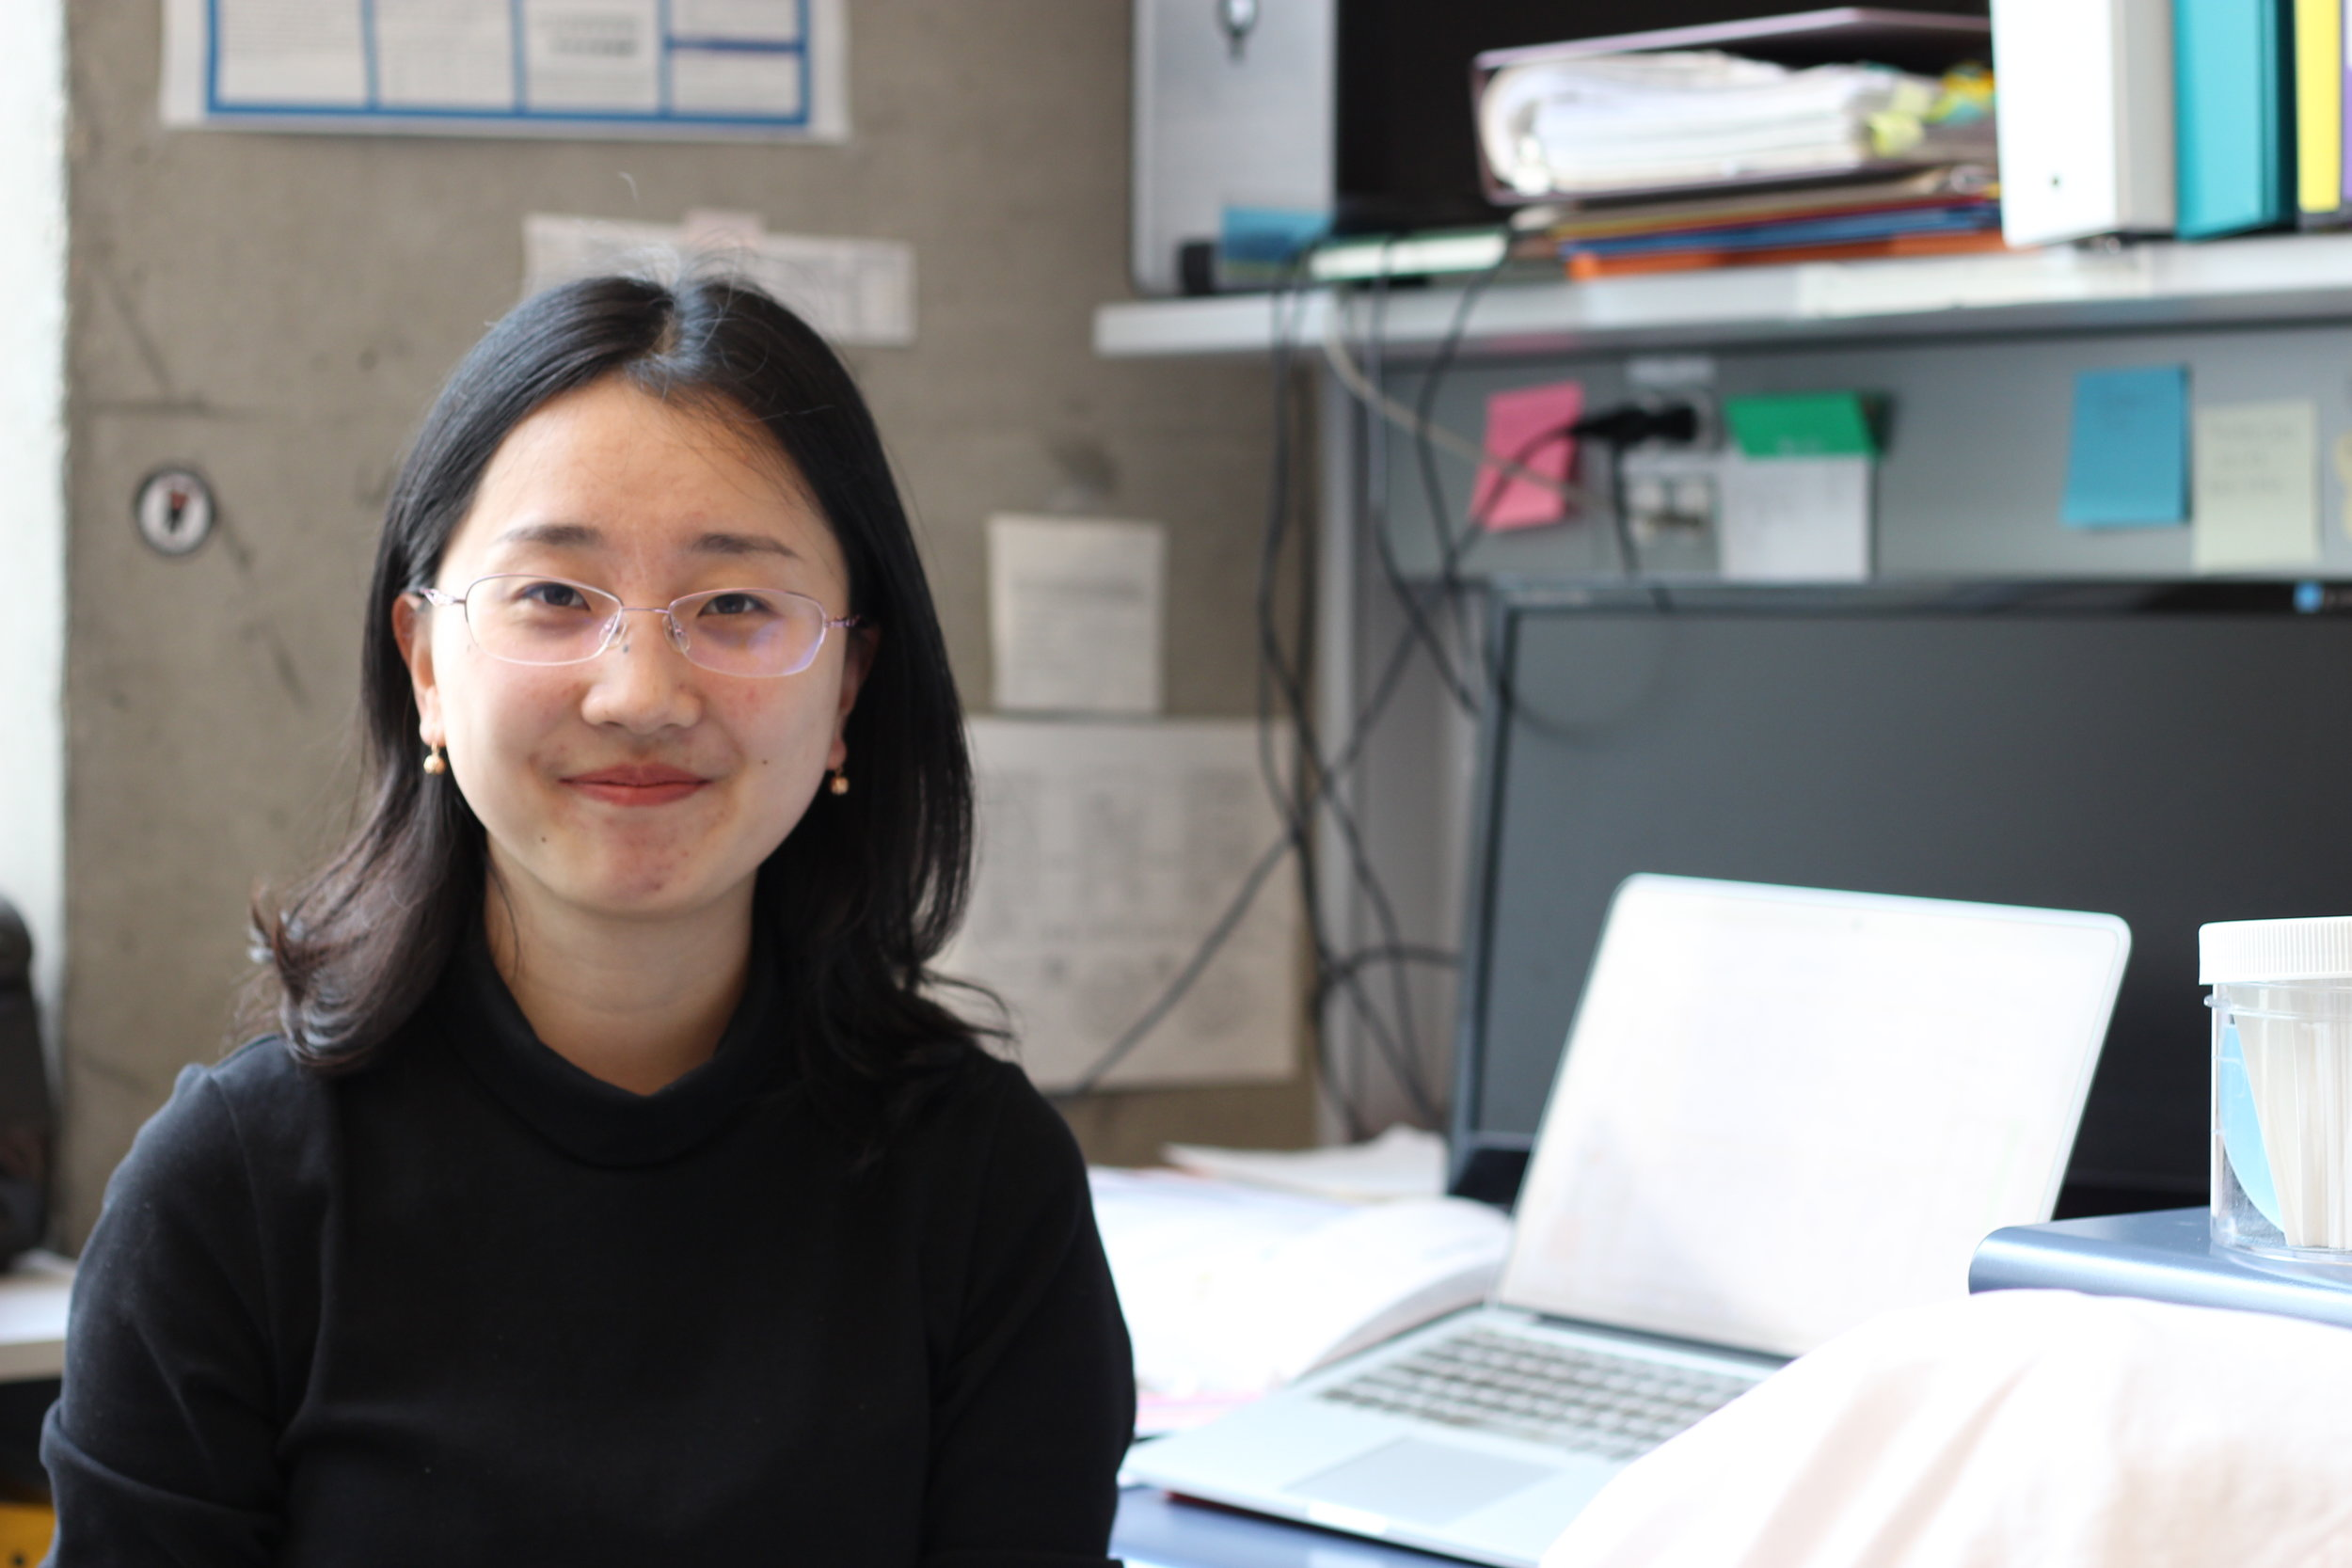 Zhiyu (Katherine) Zhao - Xi'an Jiaotong Liverpool University, 2016, BScPhD Candidate